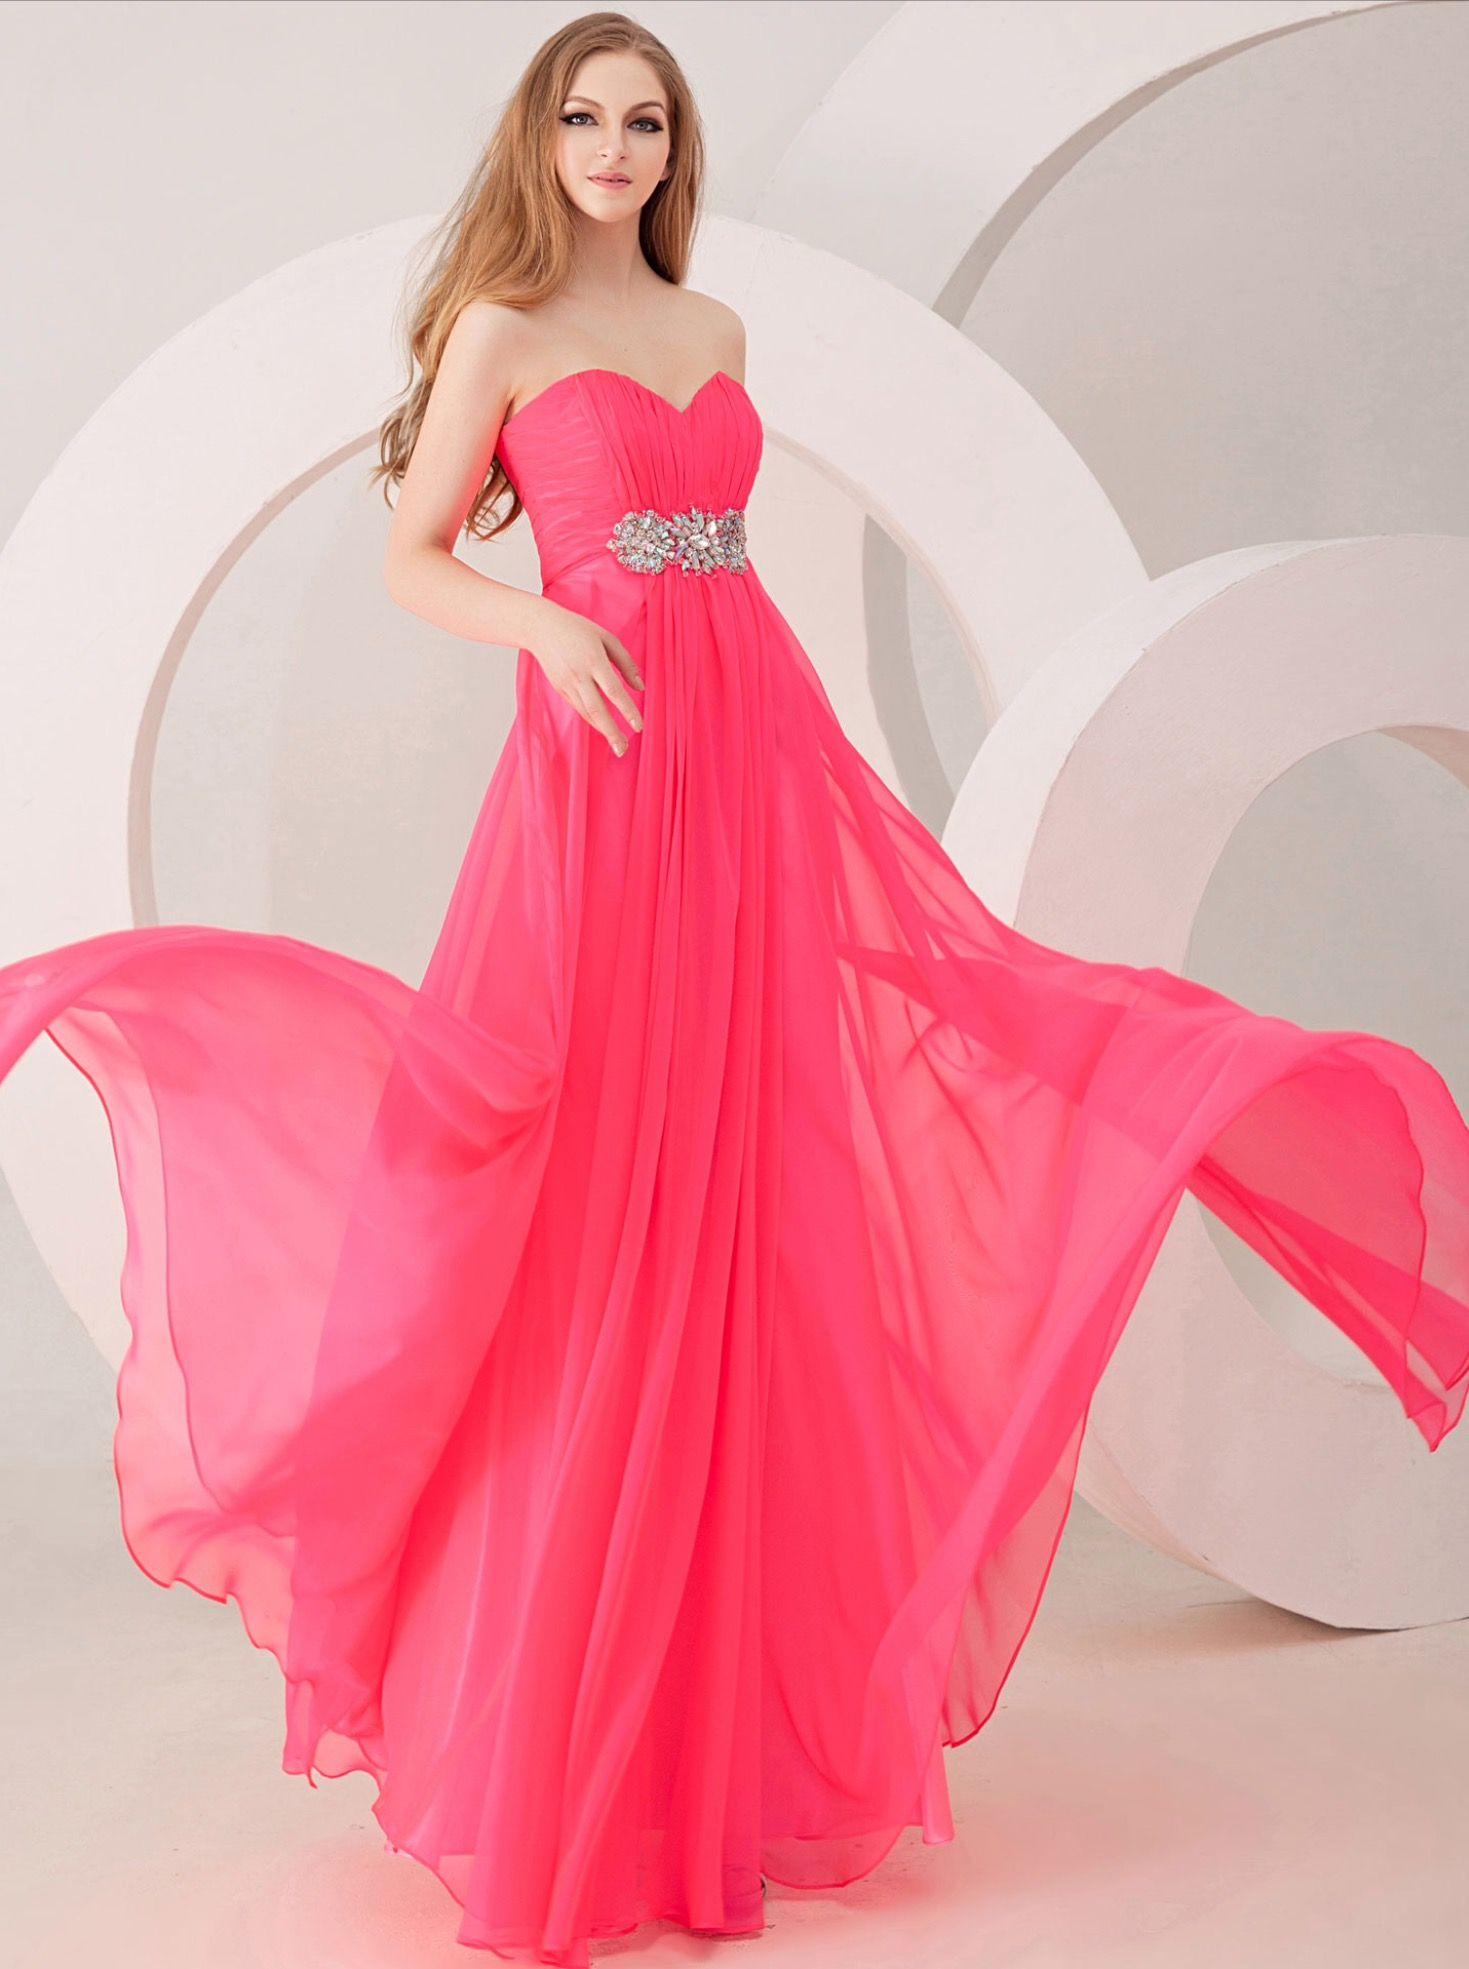 Pin de Airra en Dresses   Pinterest